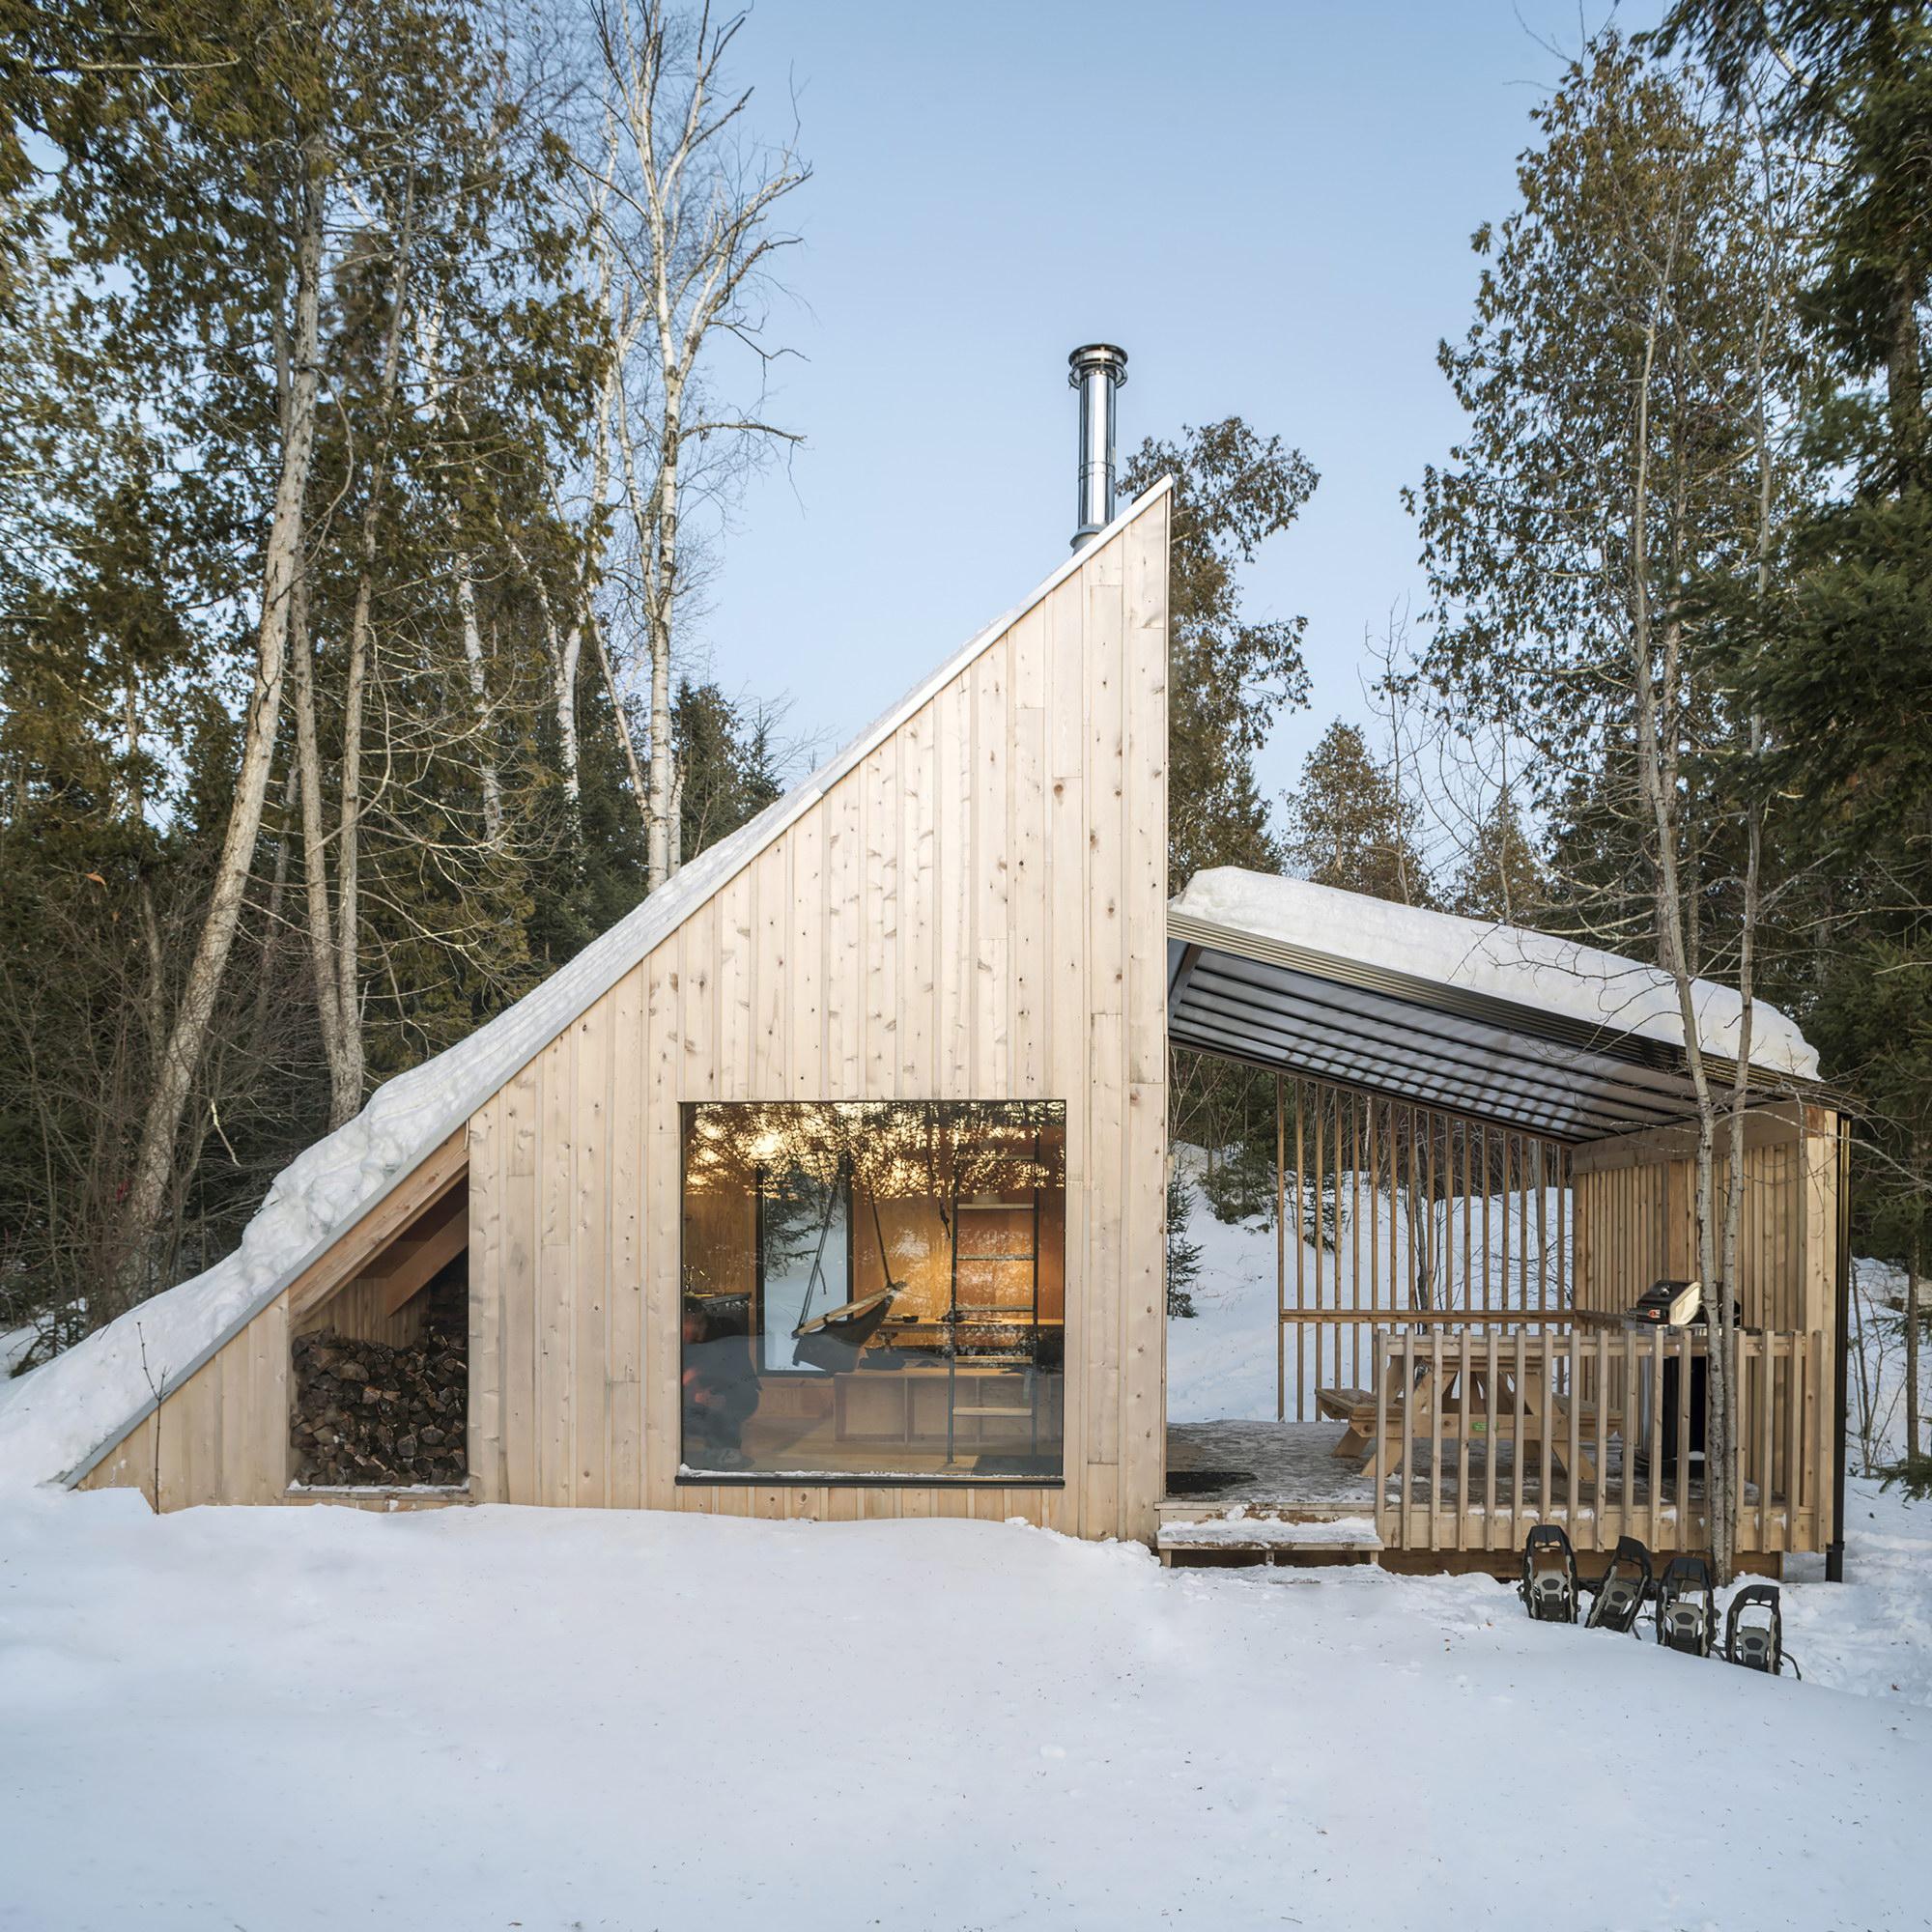 La Pointe   Reinterpretation of an A-Frame Cabin by Atelier L'abri